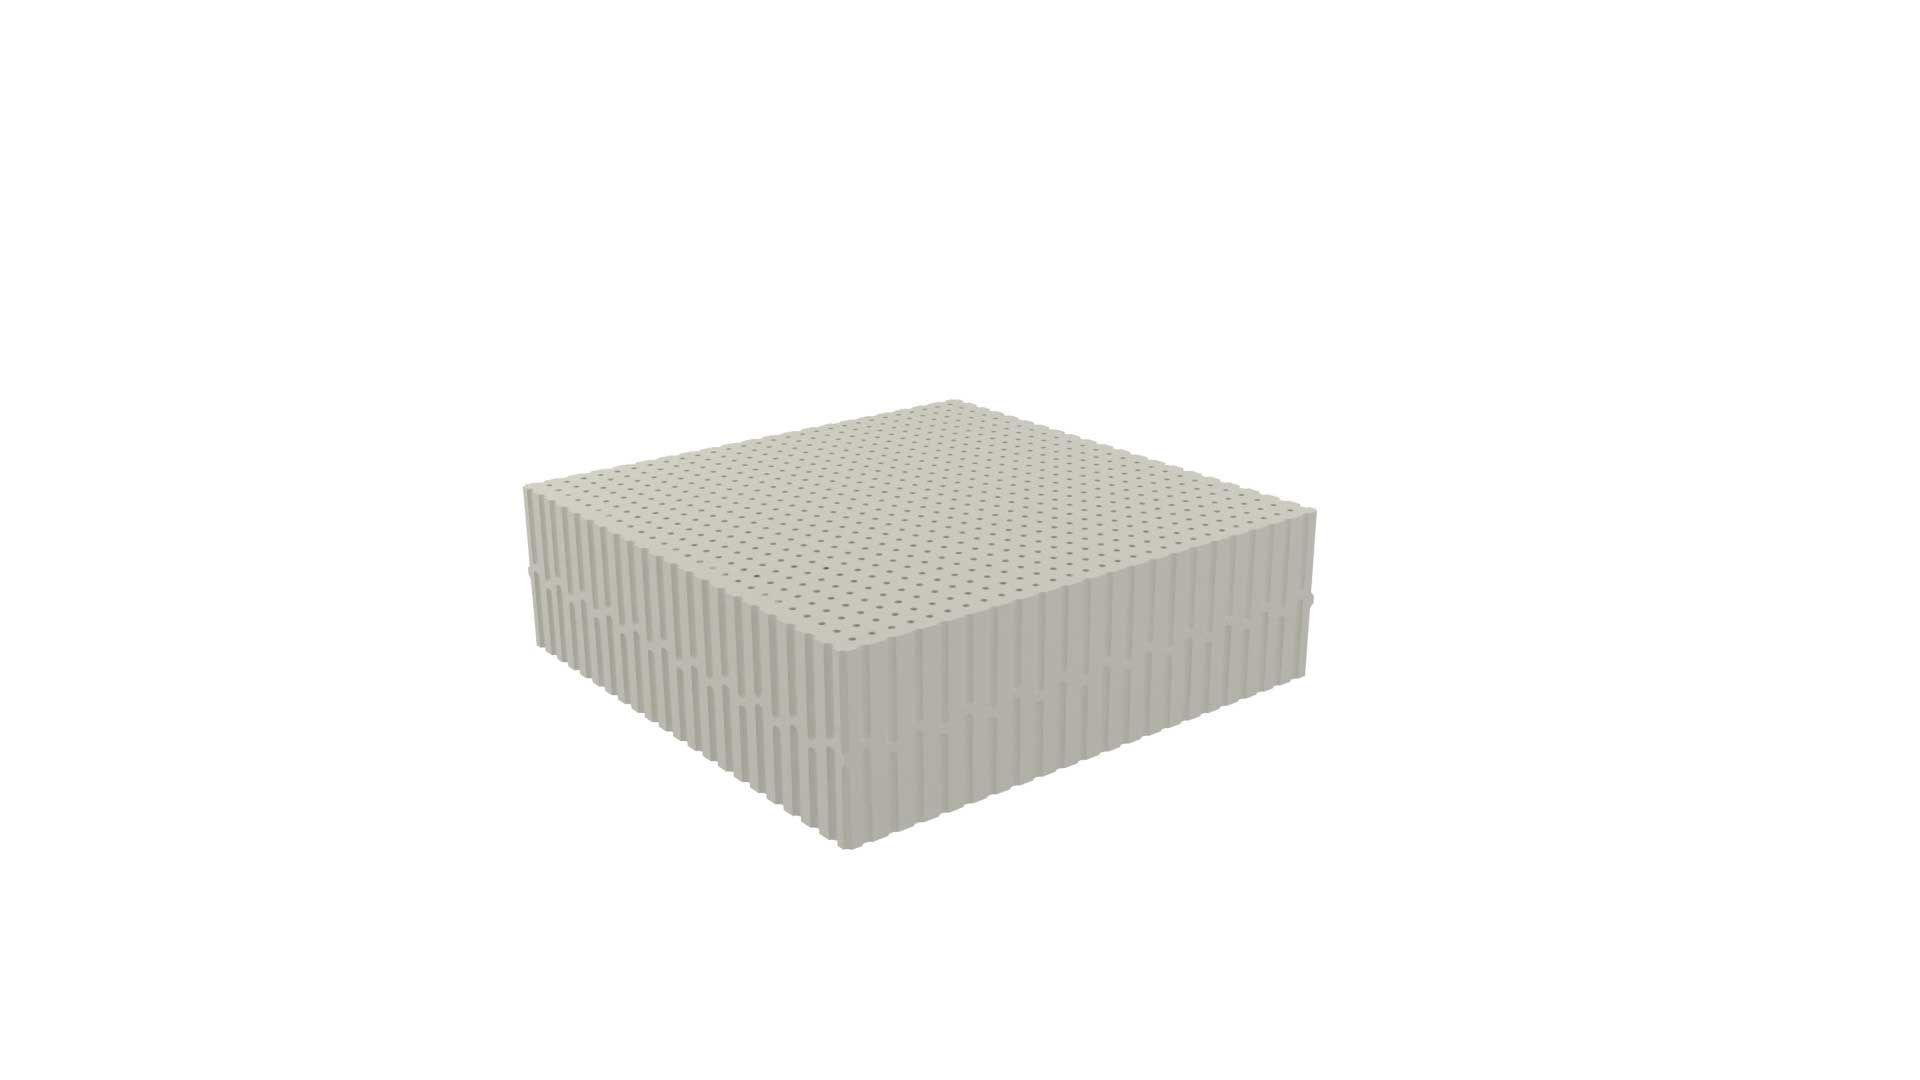 Dunlopillo High Ivoryανατομικό στρώμα, ύψους 17cm, μέτριο